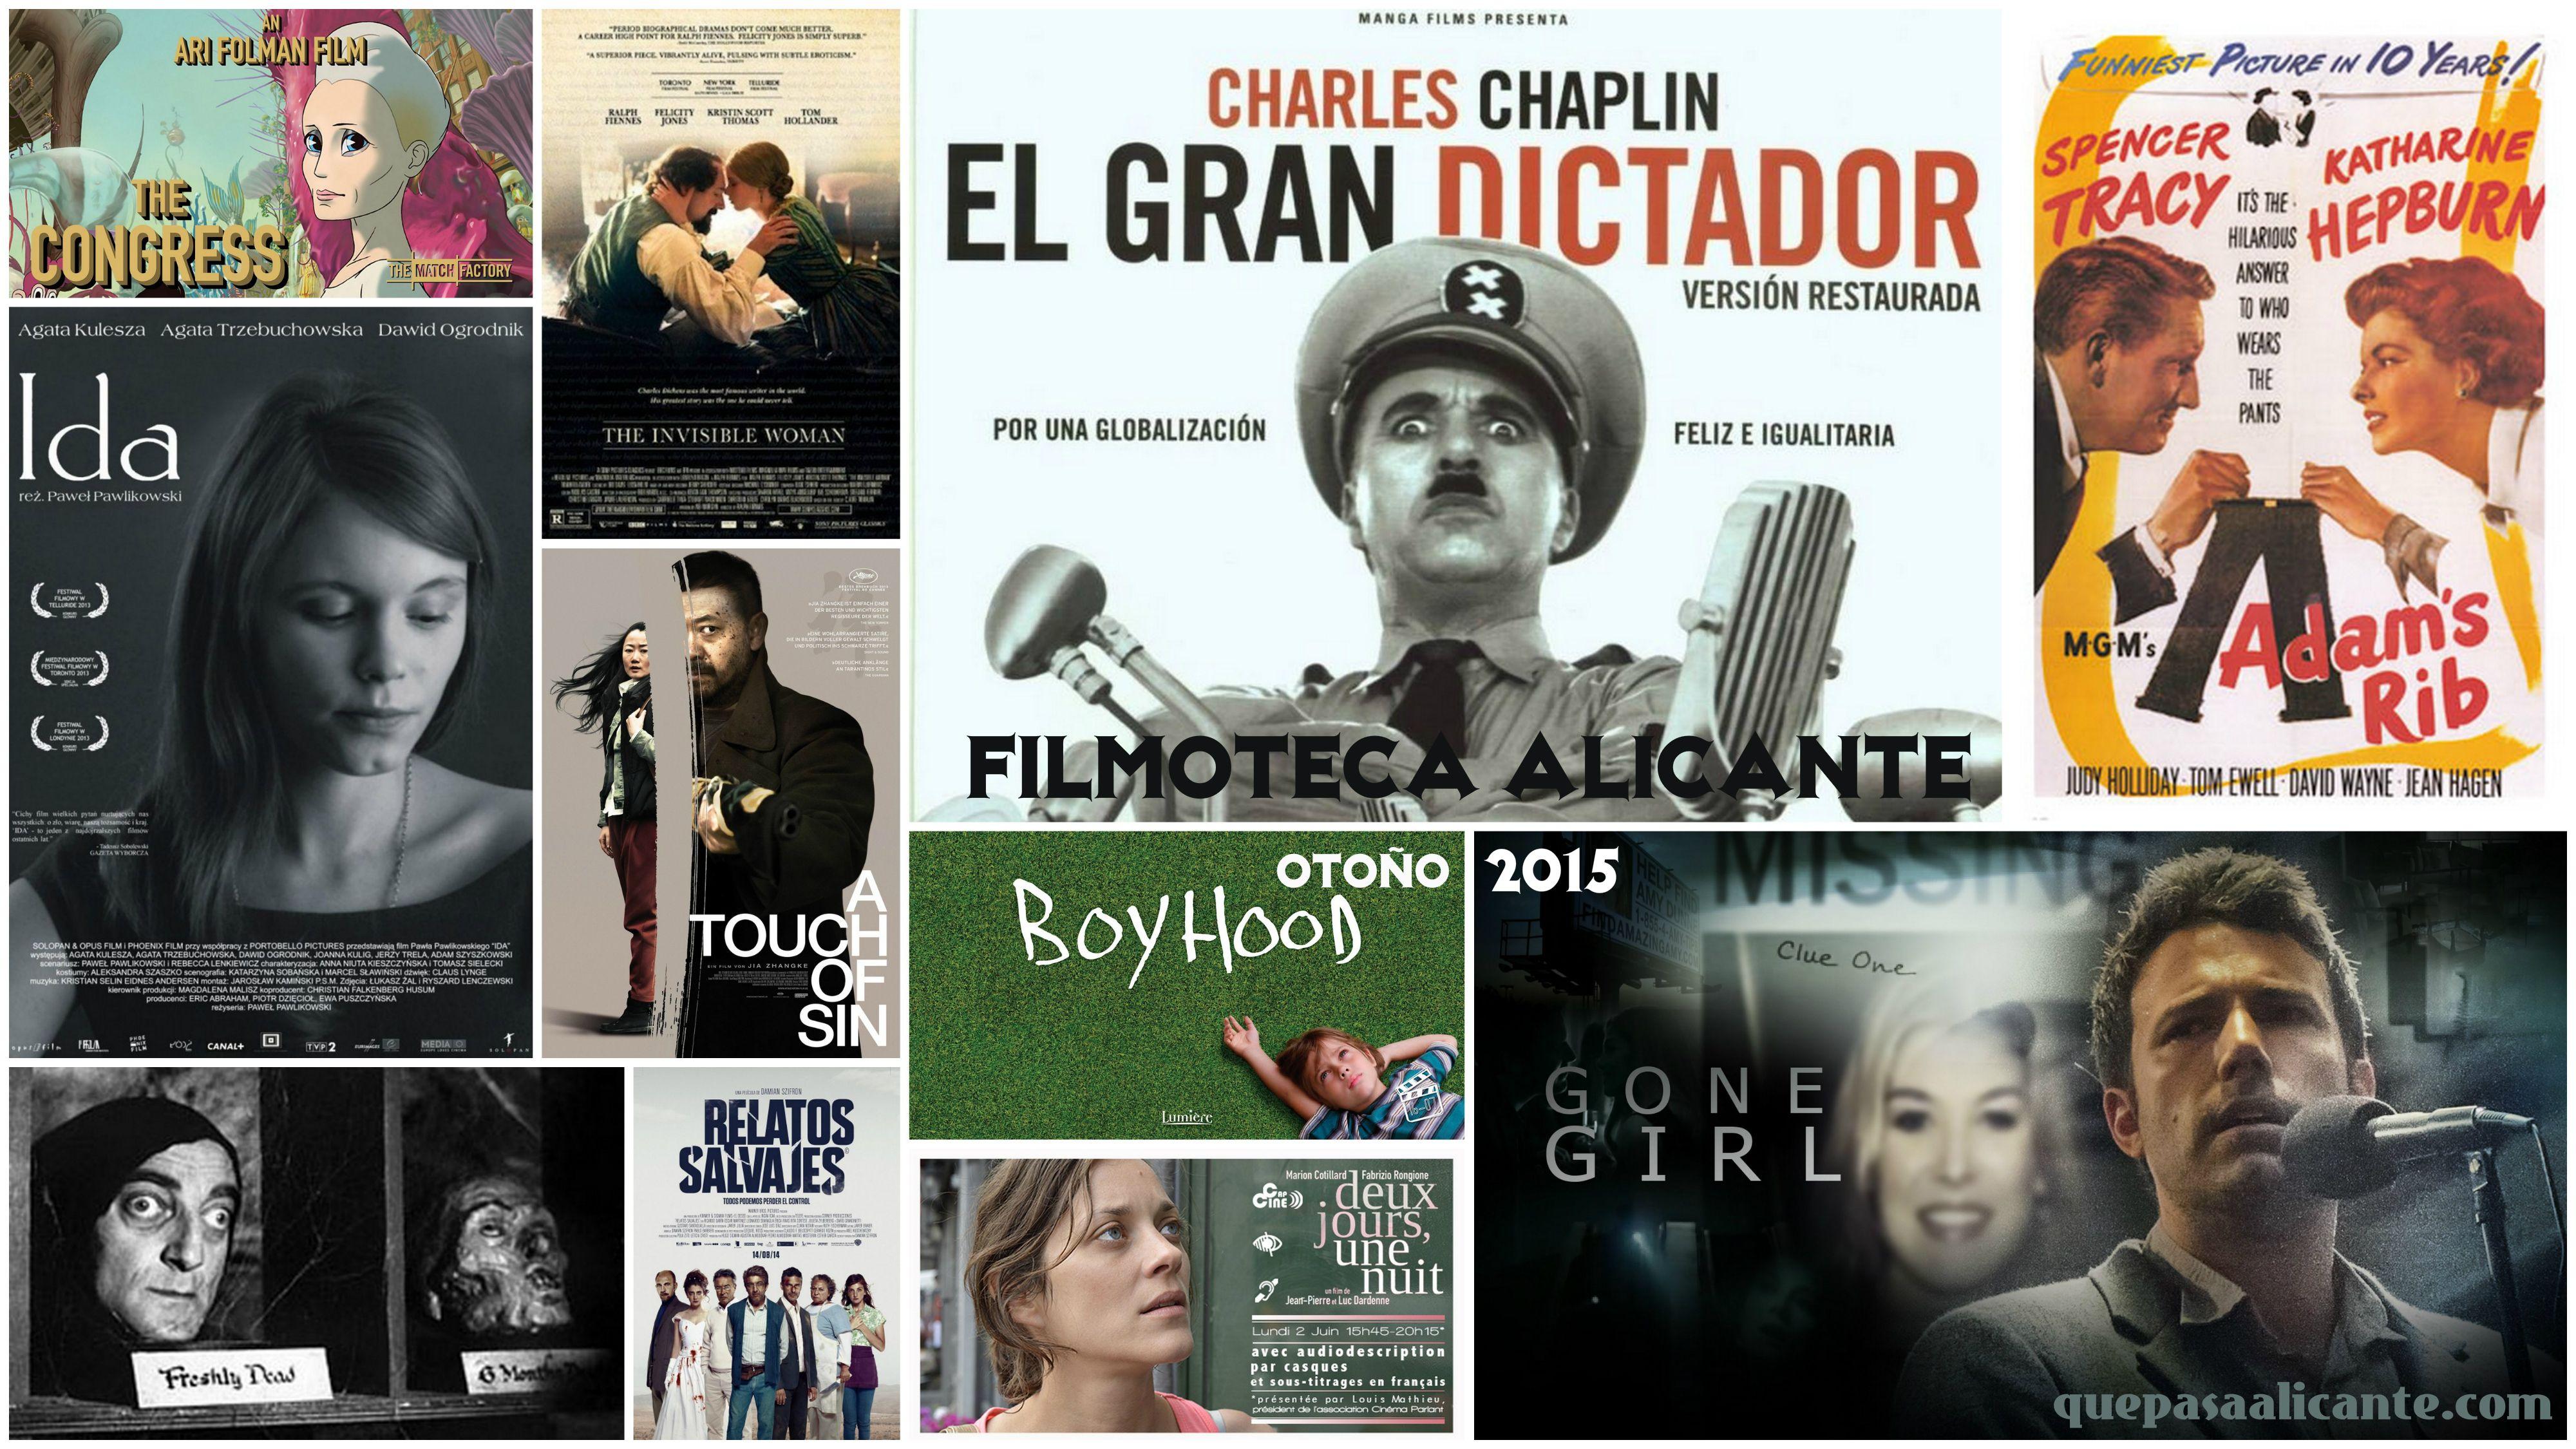 Filmoteca Alicante Otoño 2015